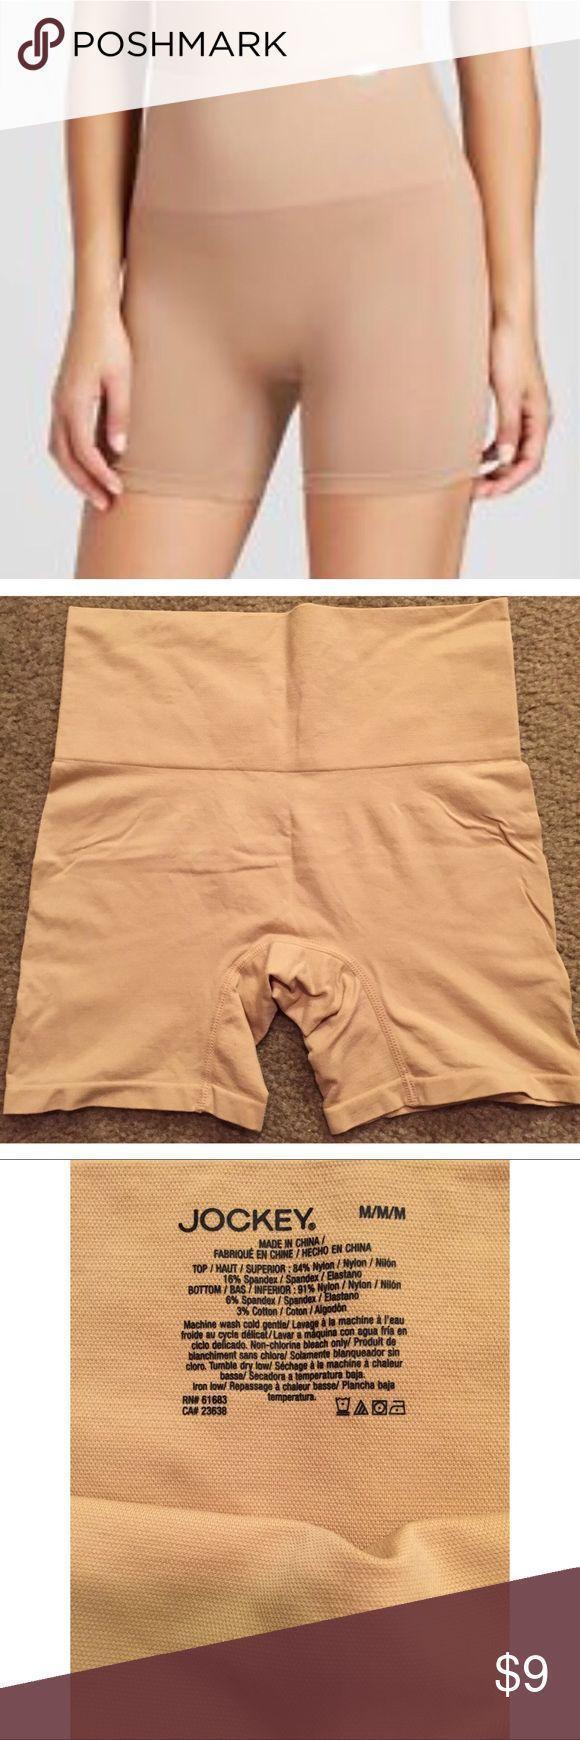 Tendance salopette 2017  Tendance salopette 2017  Jockey slimming shorts Jockey shapewear slimming shorts